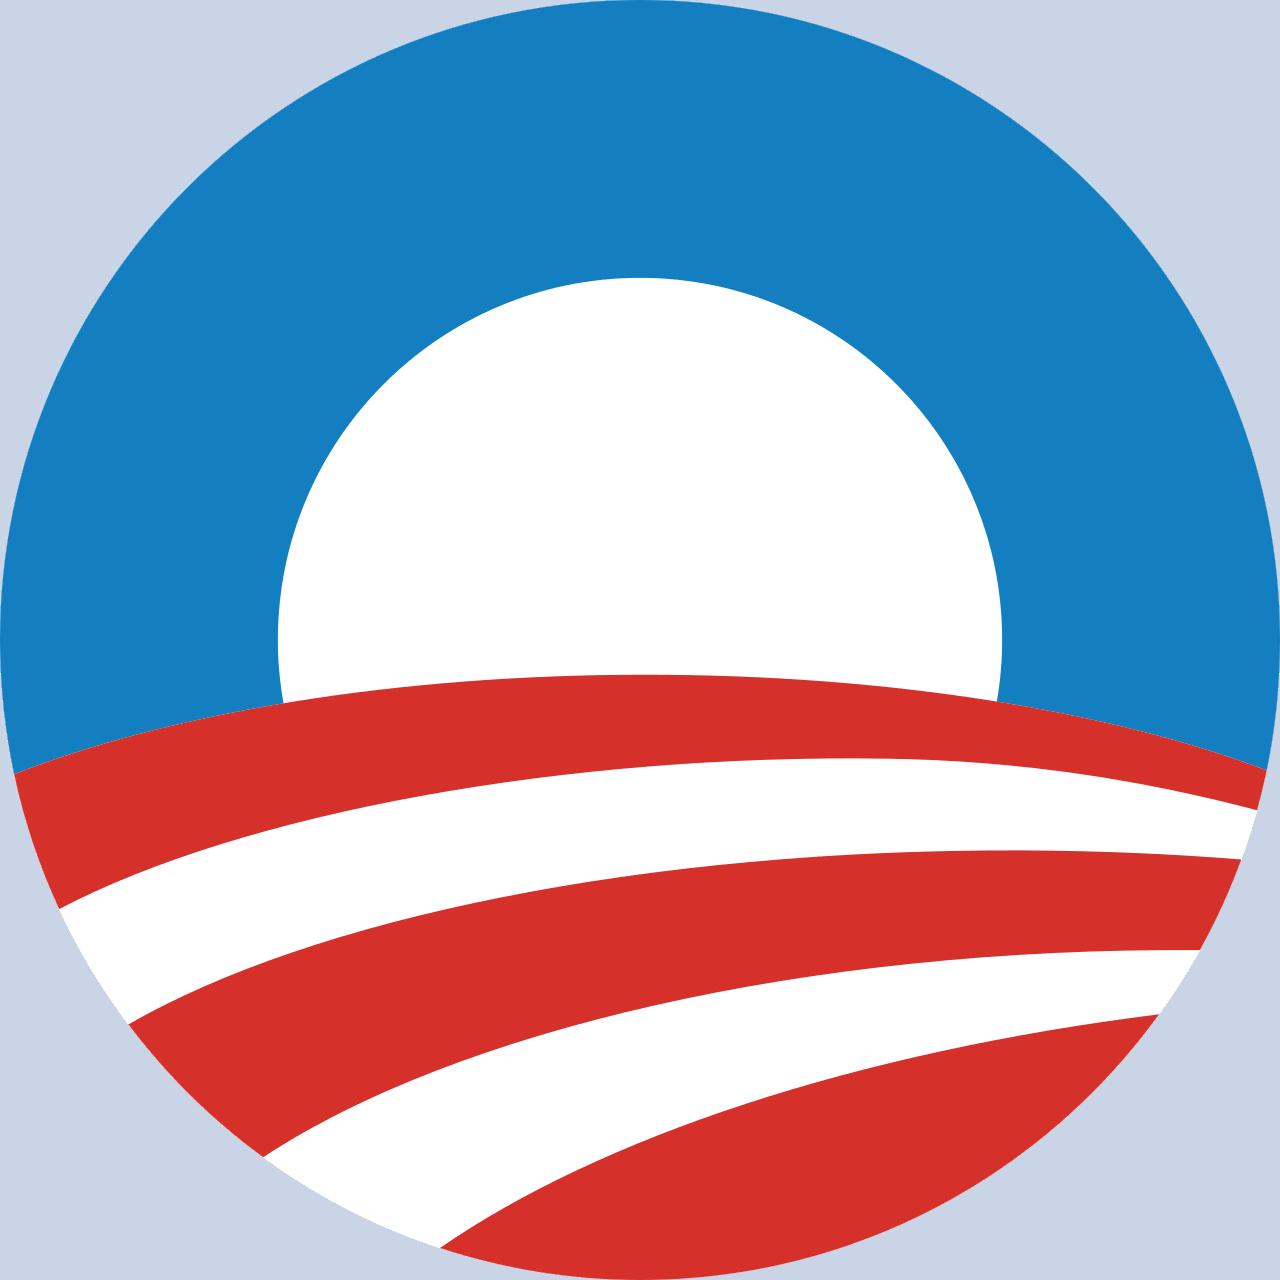 Political campaign logo - Barack Obama